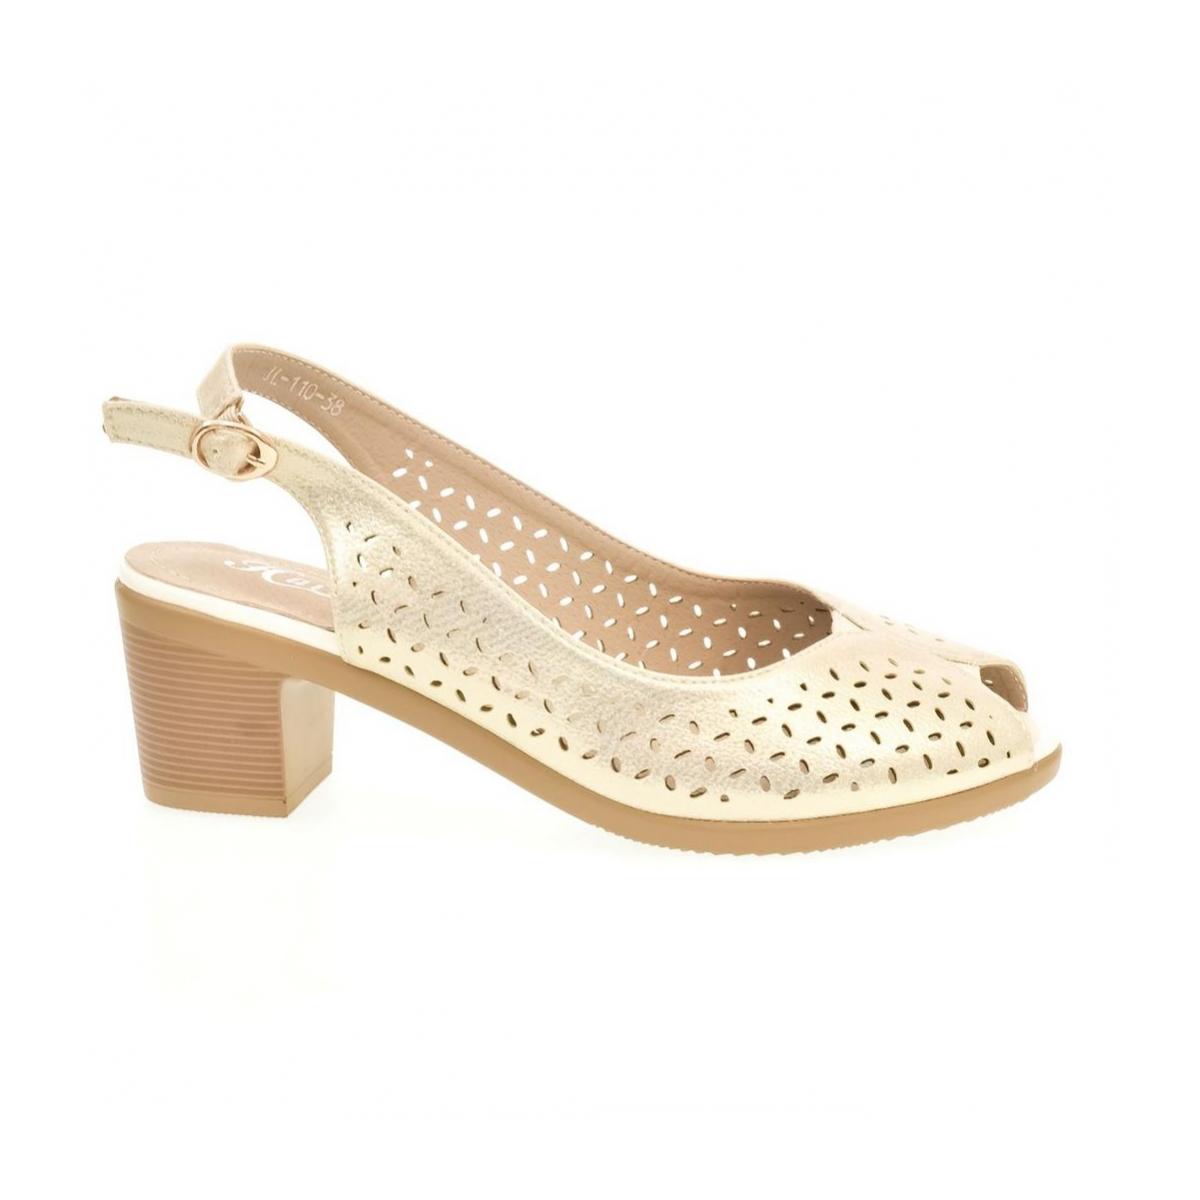 0a15dcc3bdad Dámske biele sandále SONA - 7